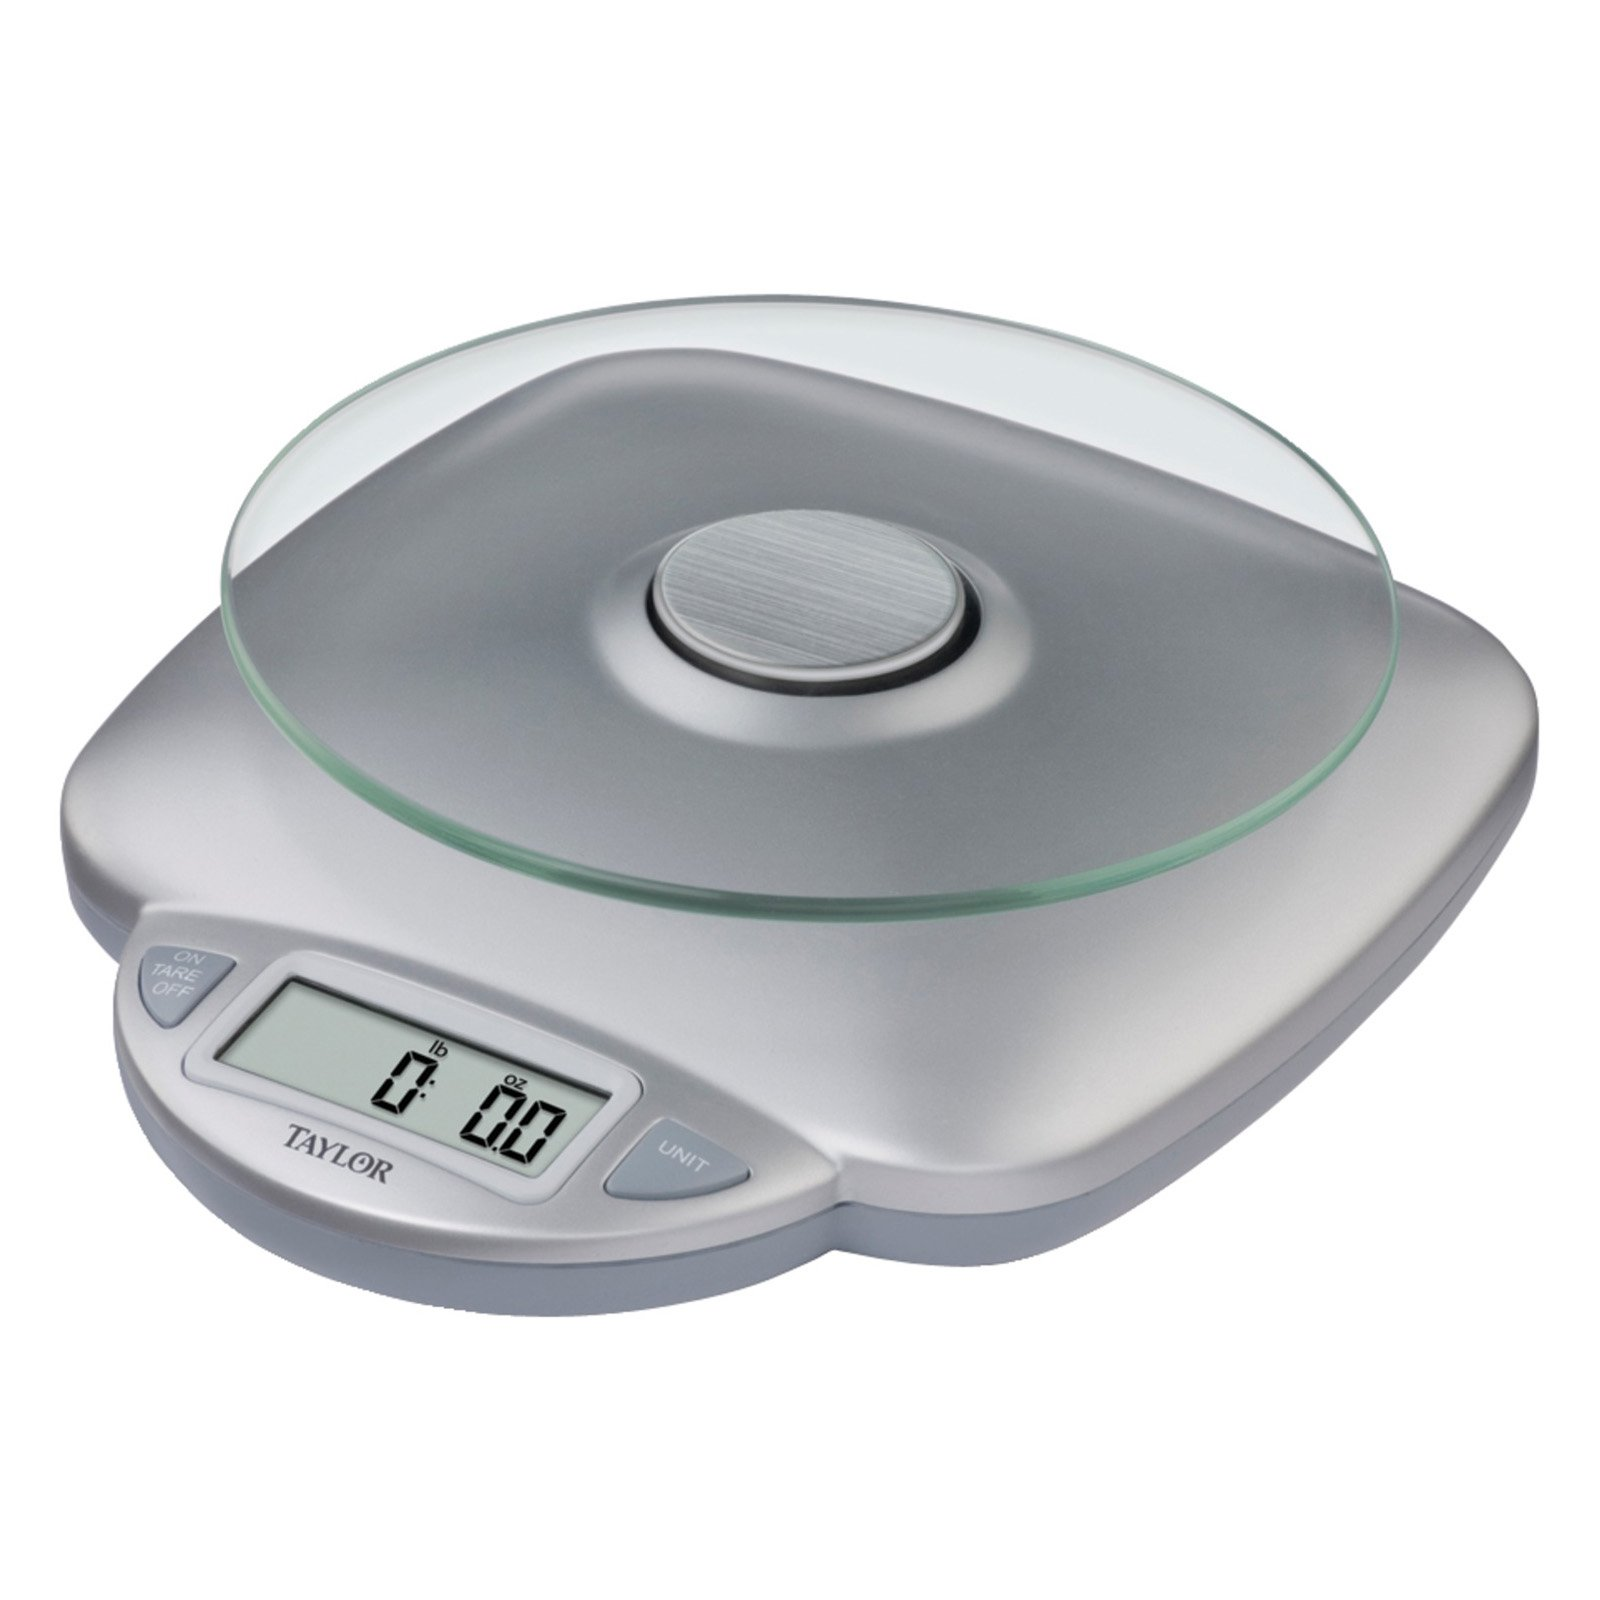 Taylor 3842 Digital Food Scale